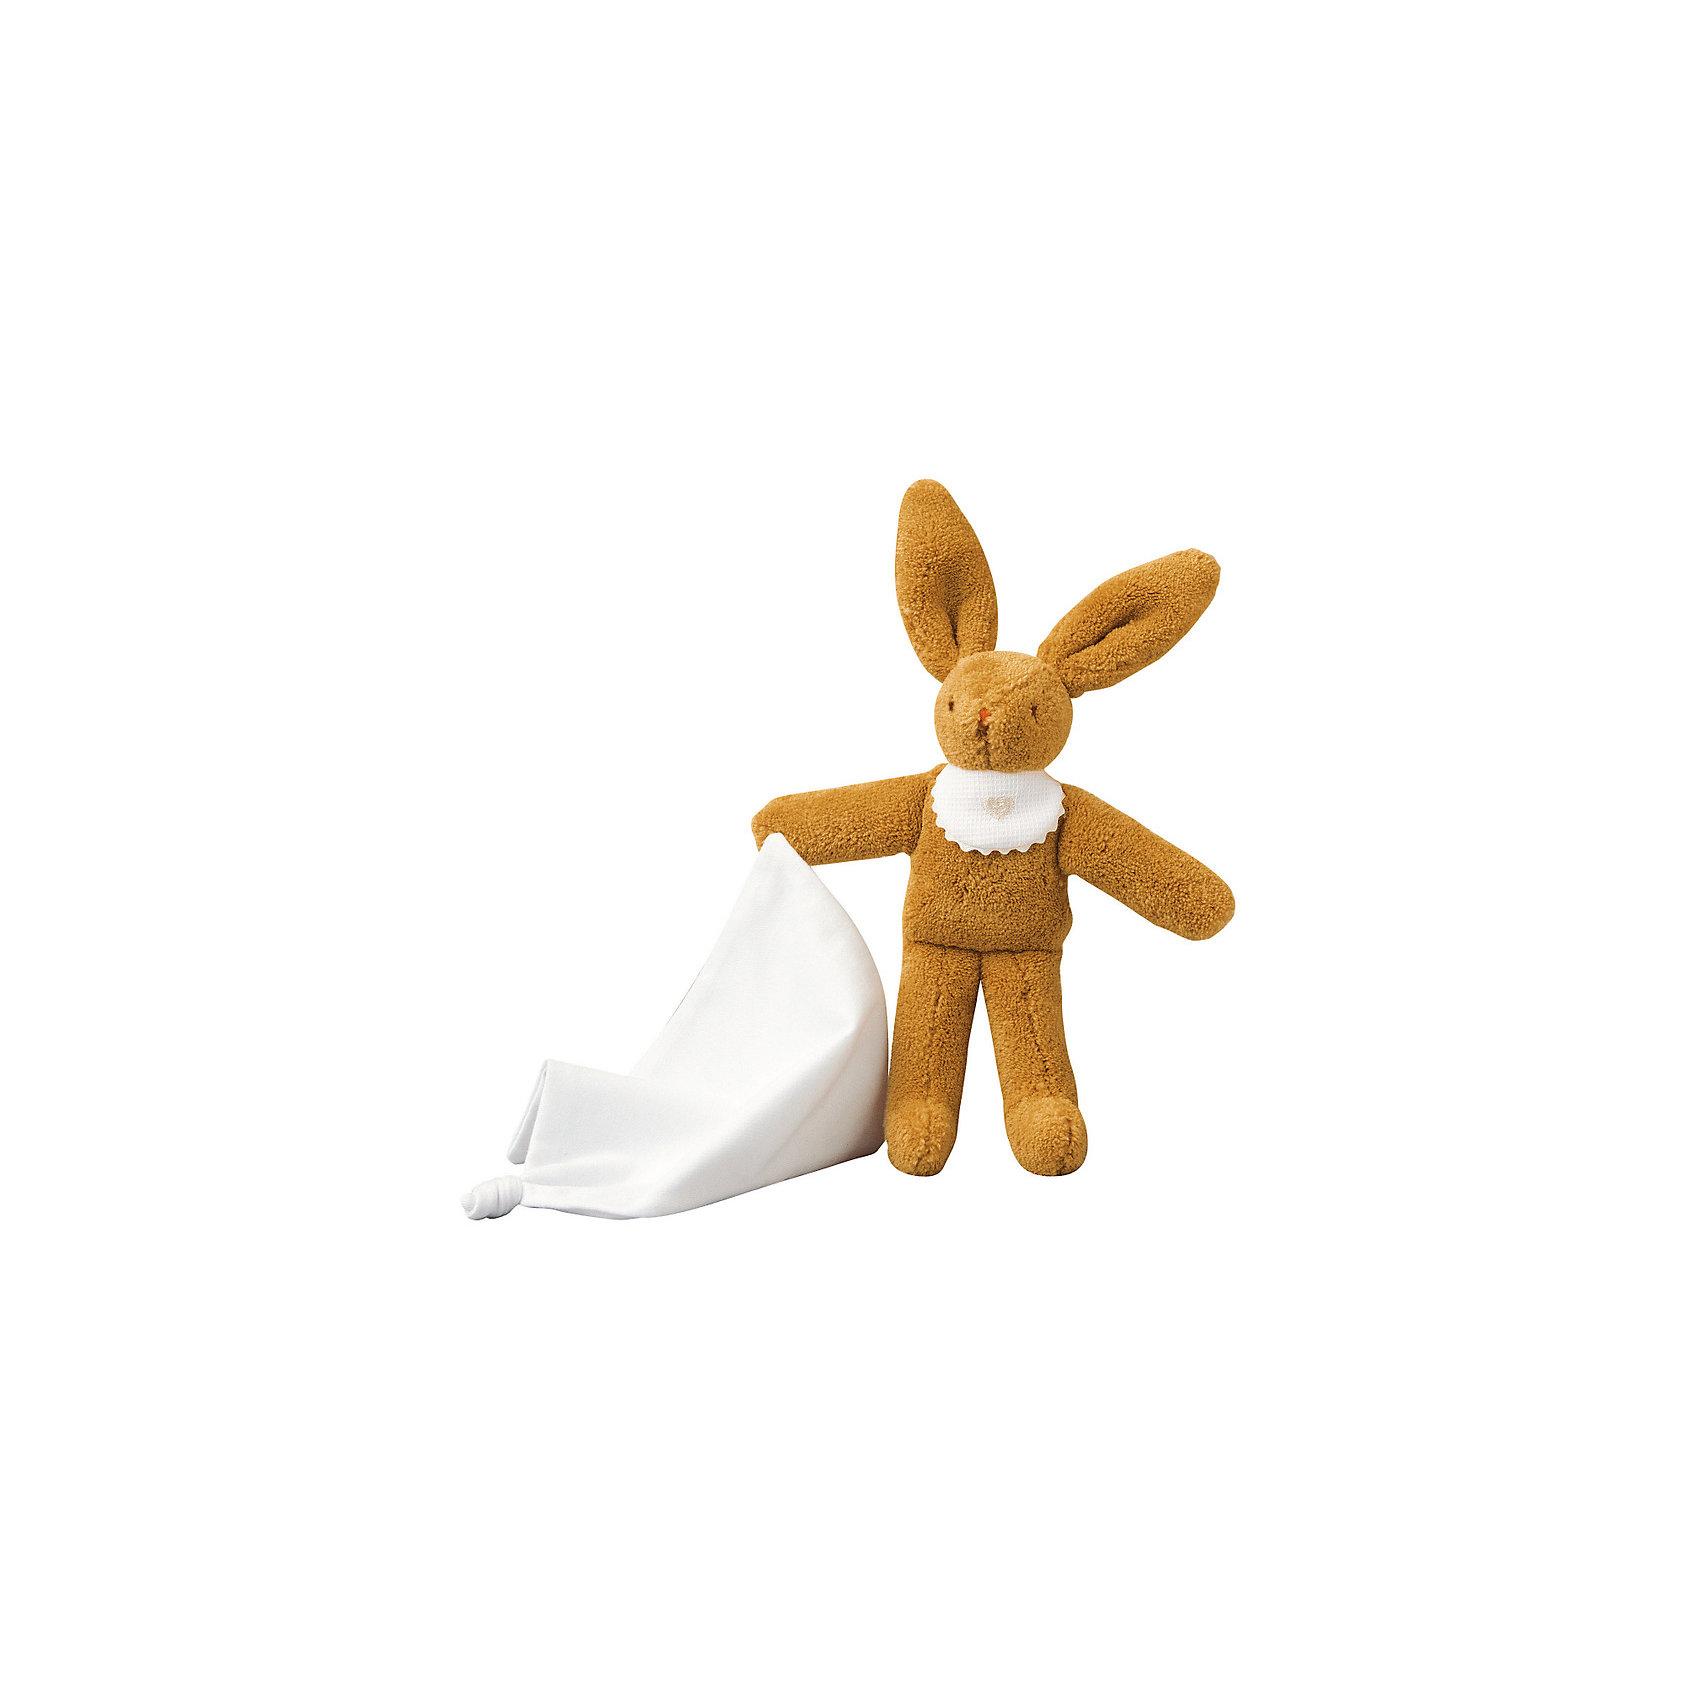 TROUSSELIER Мягкая игрушка Зайка с платочком, 20см, Trousselier trousselier мягкая игрушка зайка с музыкой розовый 25см trousselier